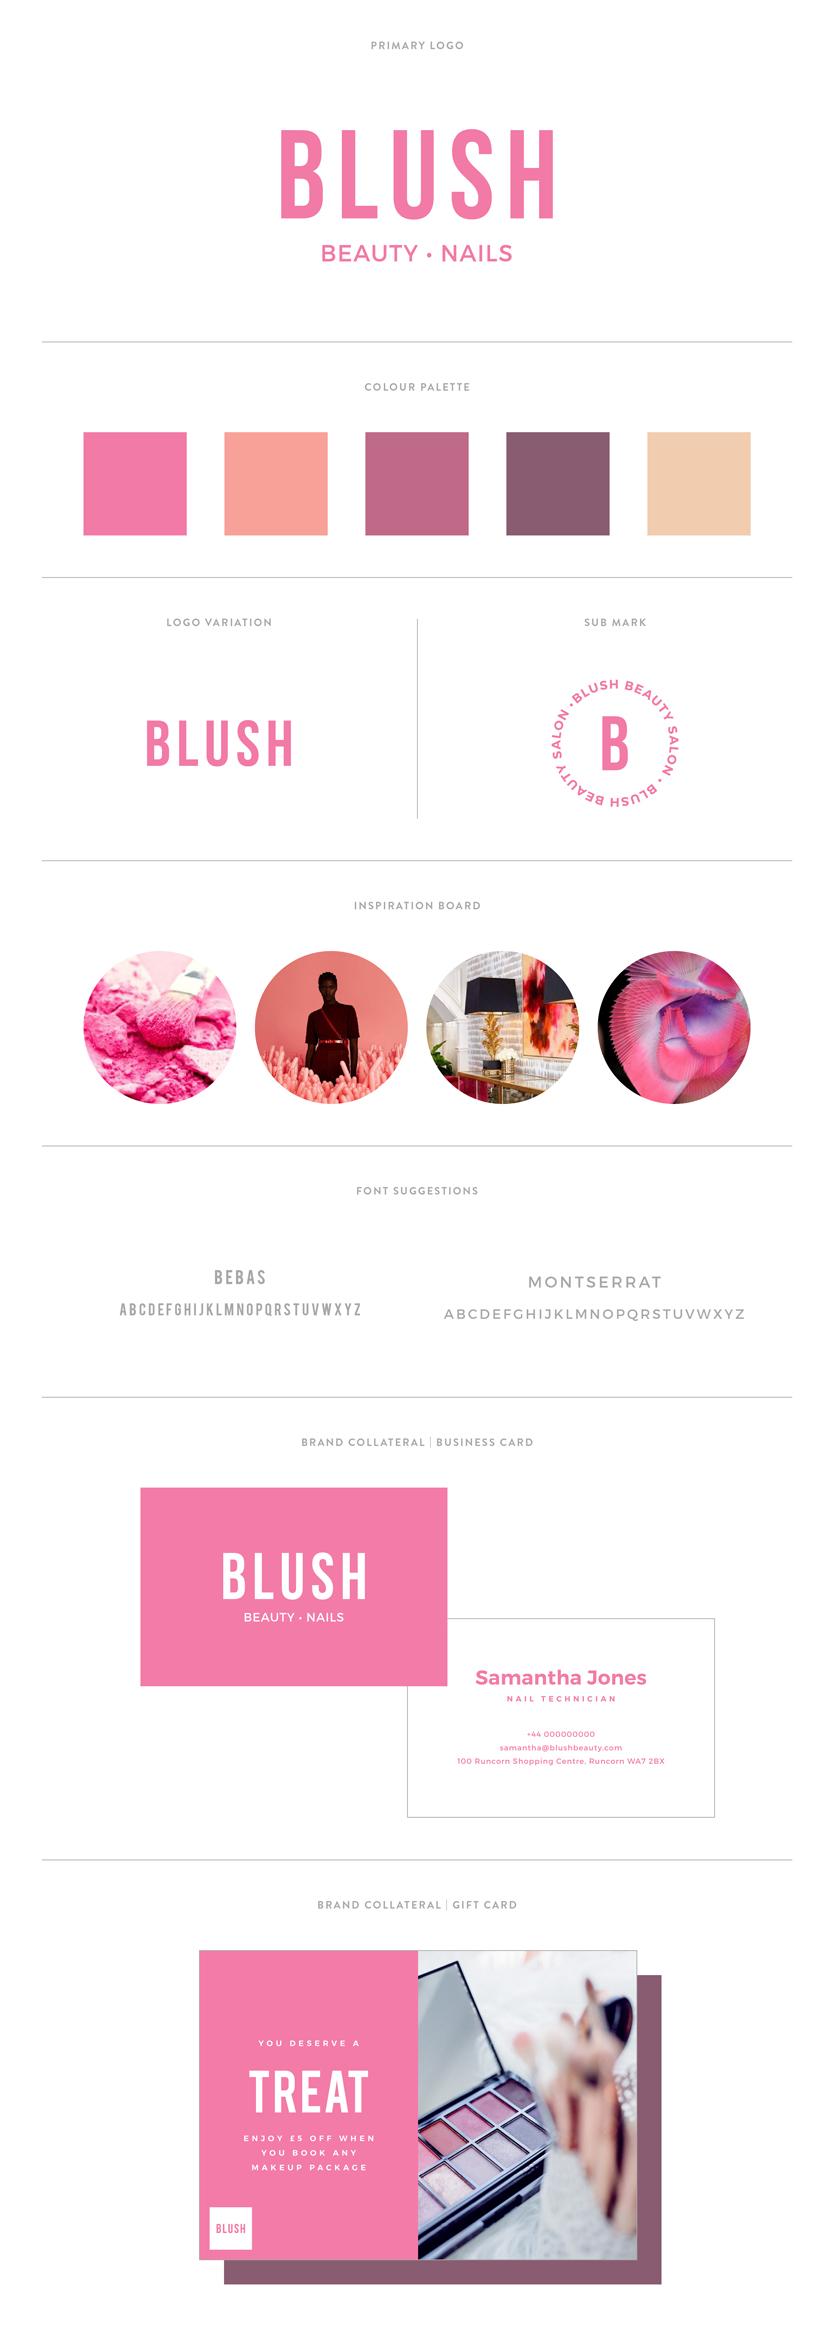 Blush-Brand-Guidelines.jpg